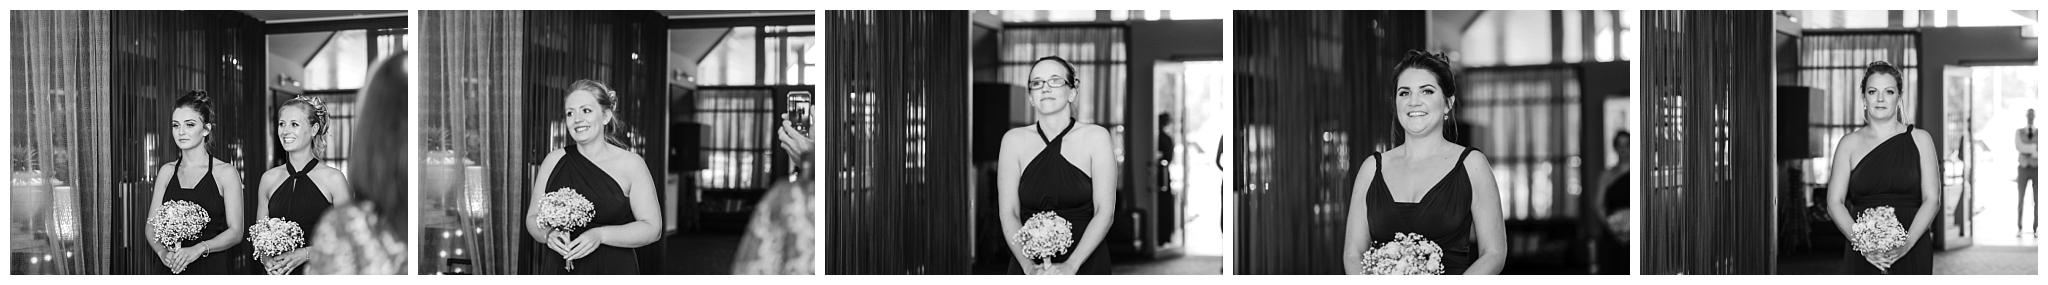 Perth Wedding Photography Portofinos Ceremony